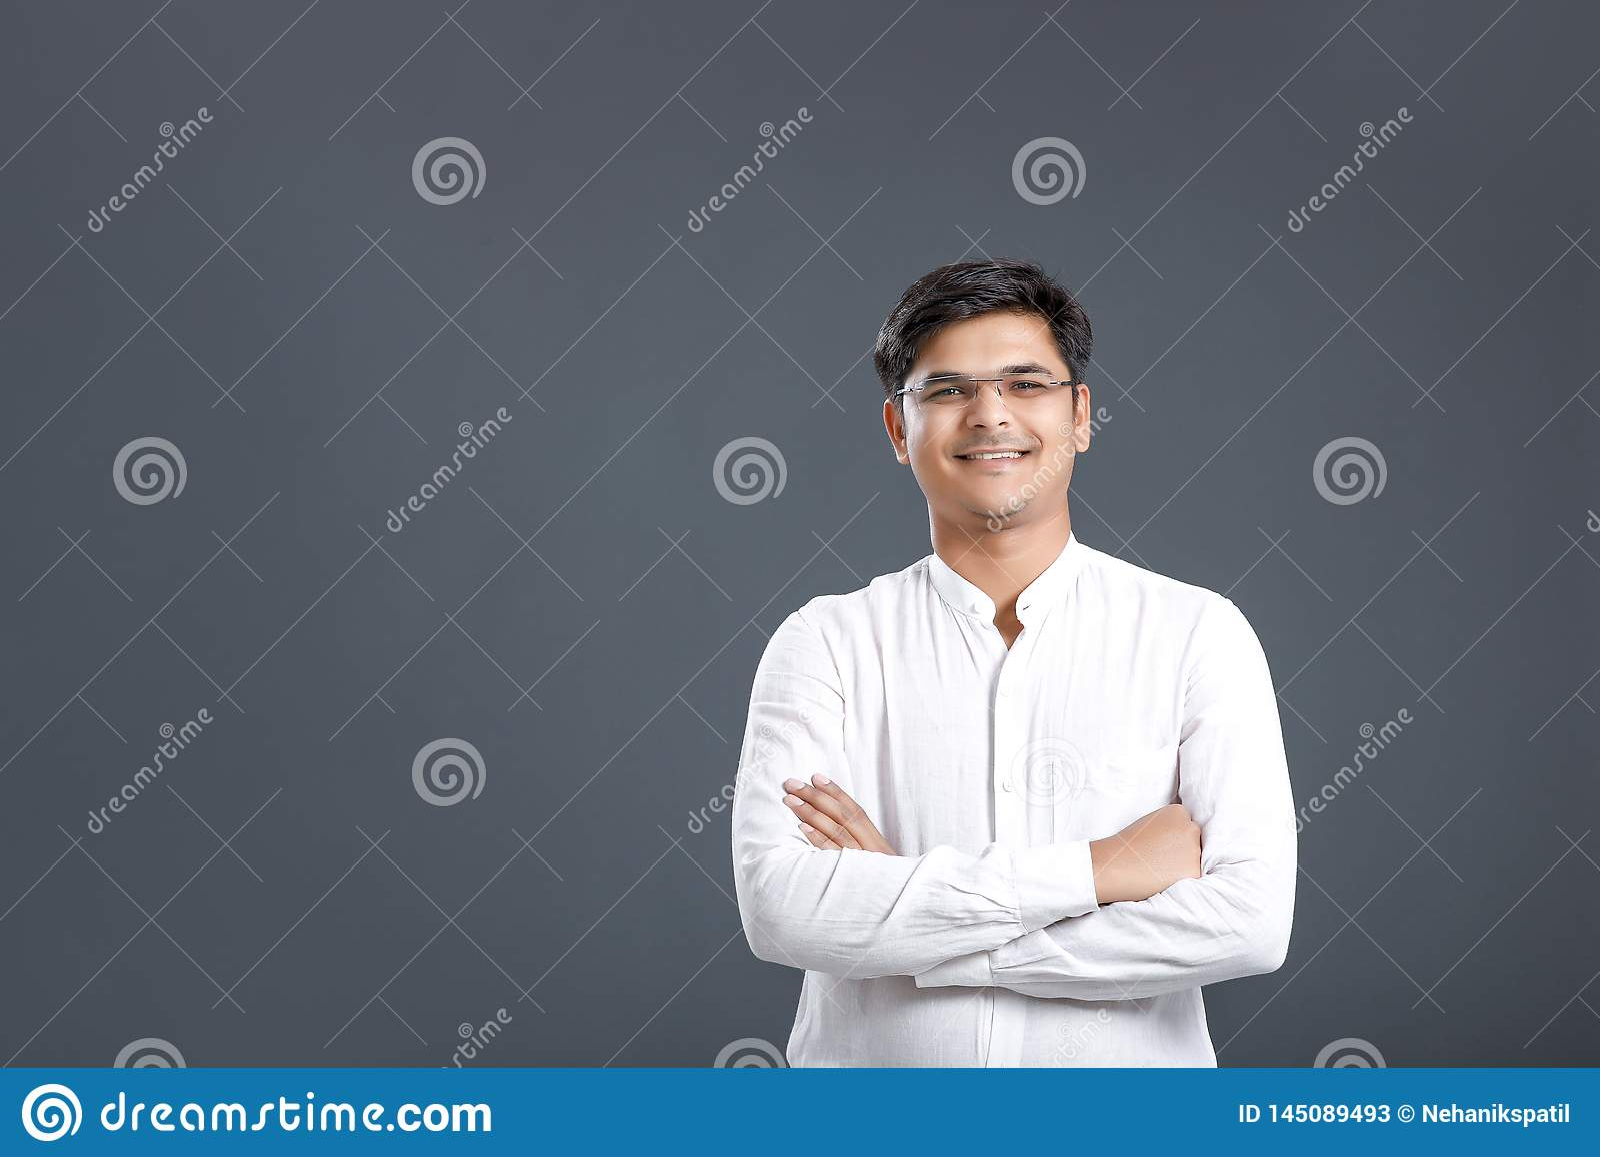 Indian man young